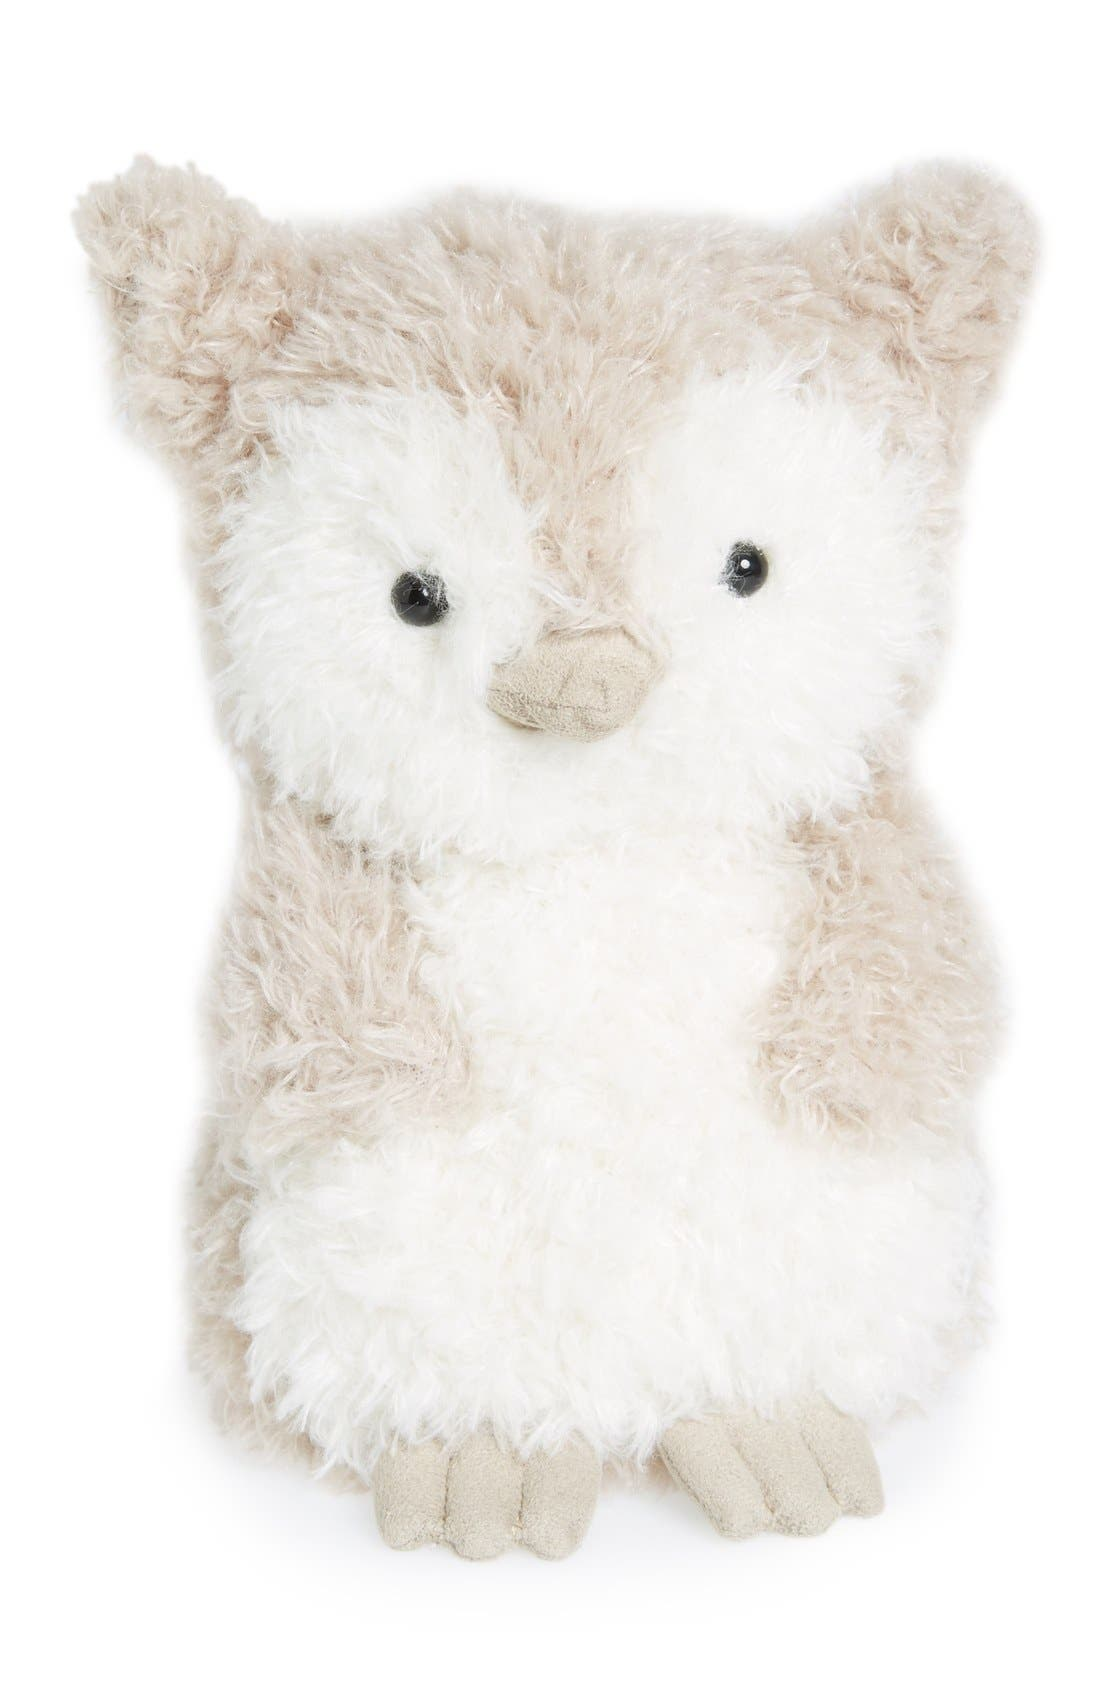 'Wake Up Little Owl' Stuffed Animal,                             Main thumbnail 1, color,                             Grey